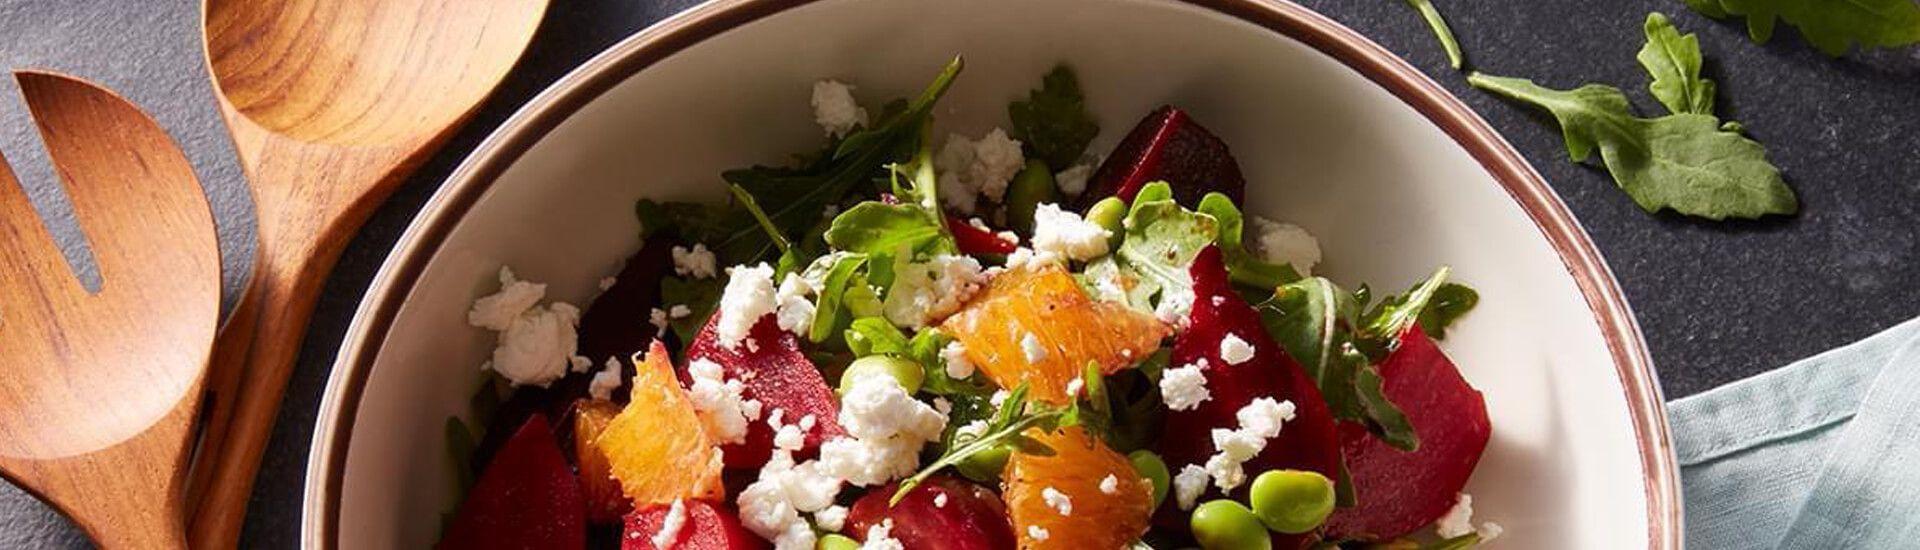 Beet Salad with Orange, Edamame and Goat Cheese